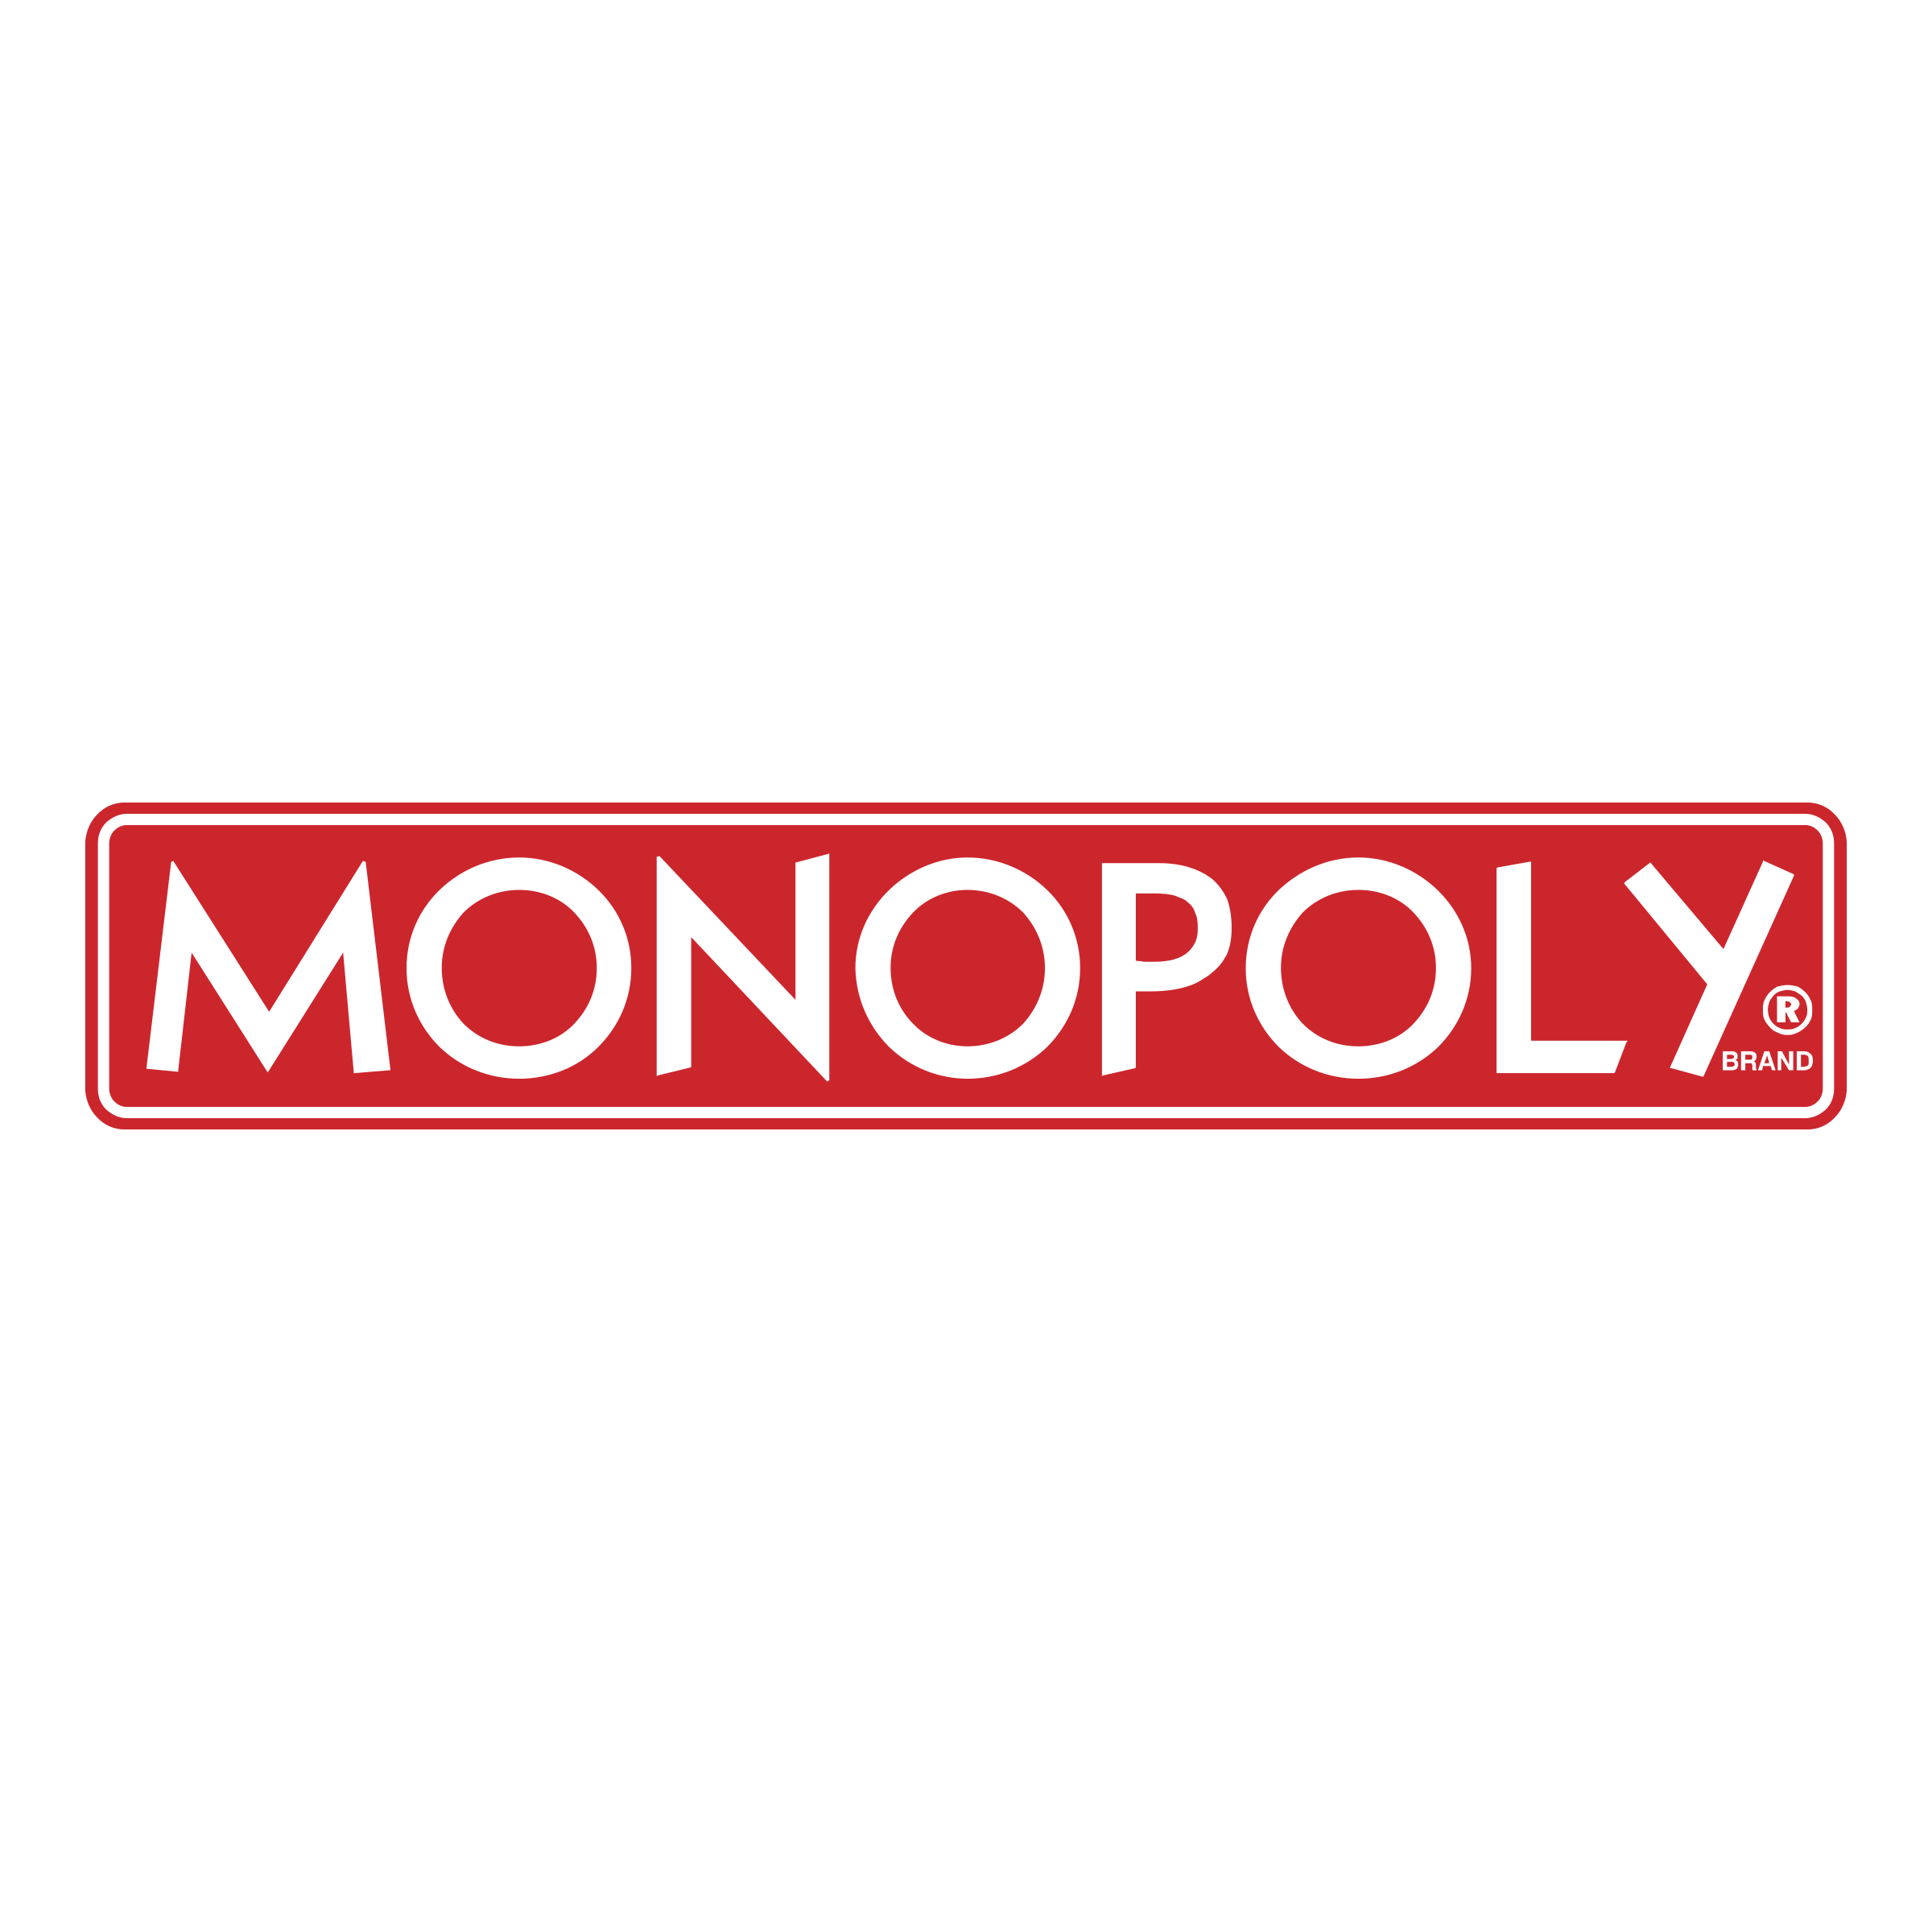 monopoly logo png transparent amp svg vector freebie supply